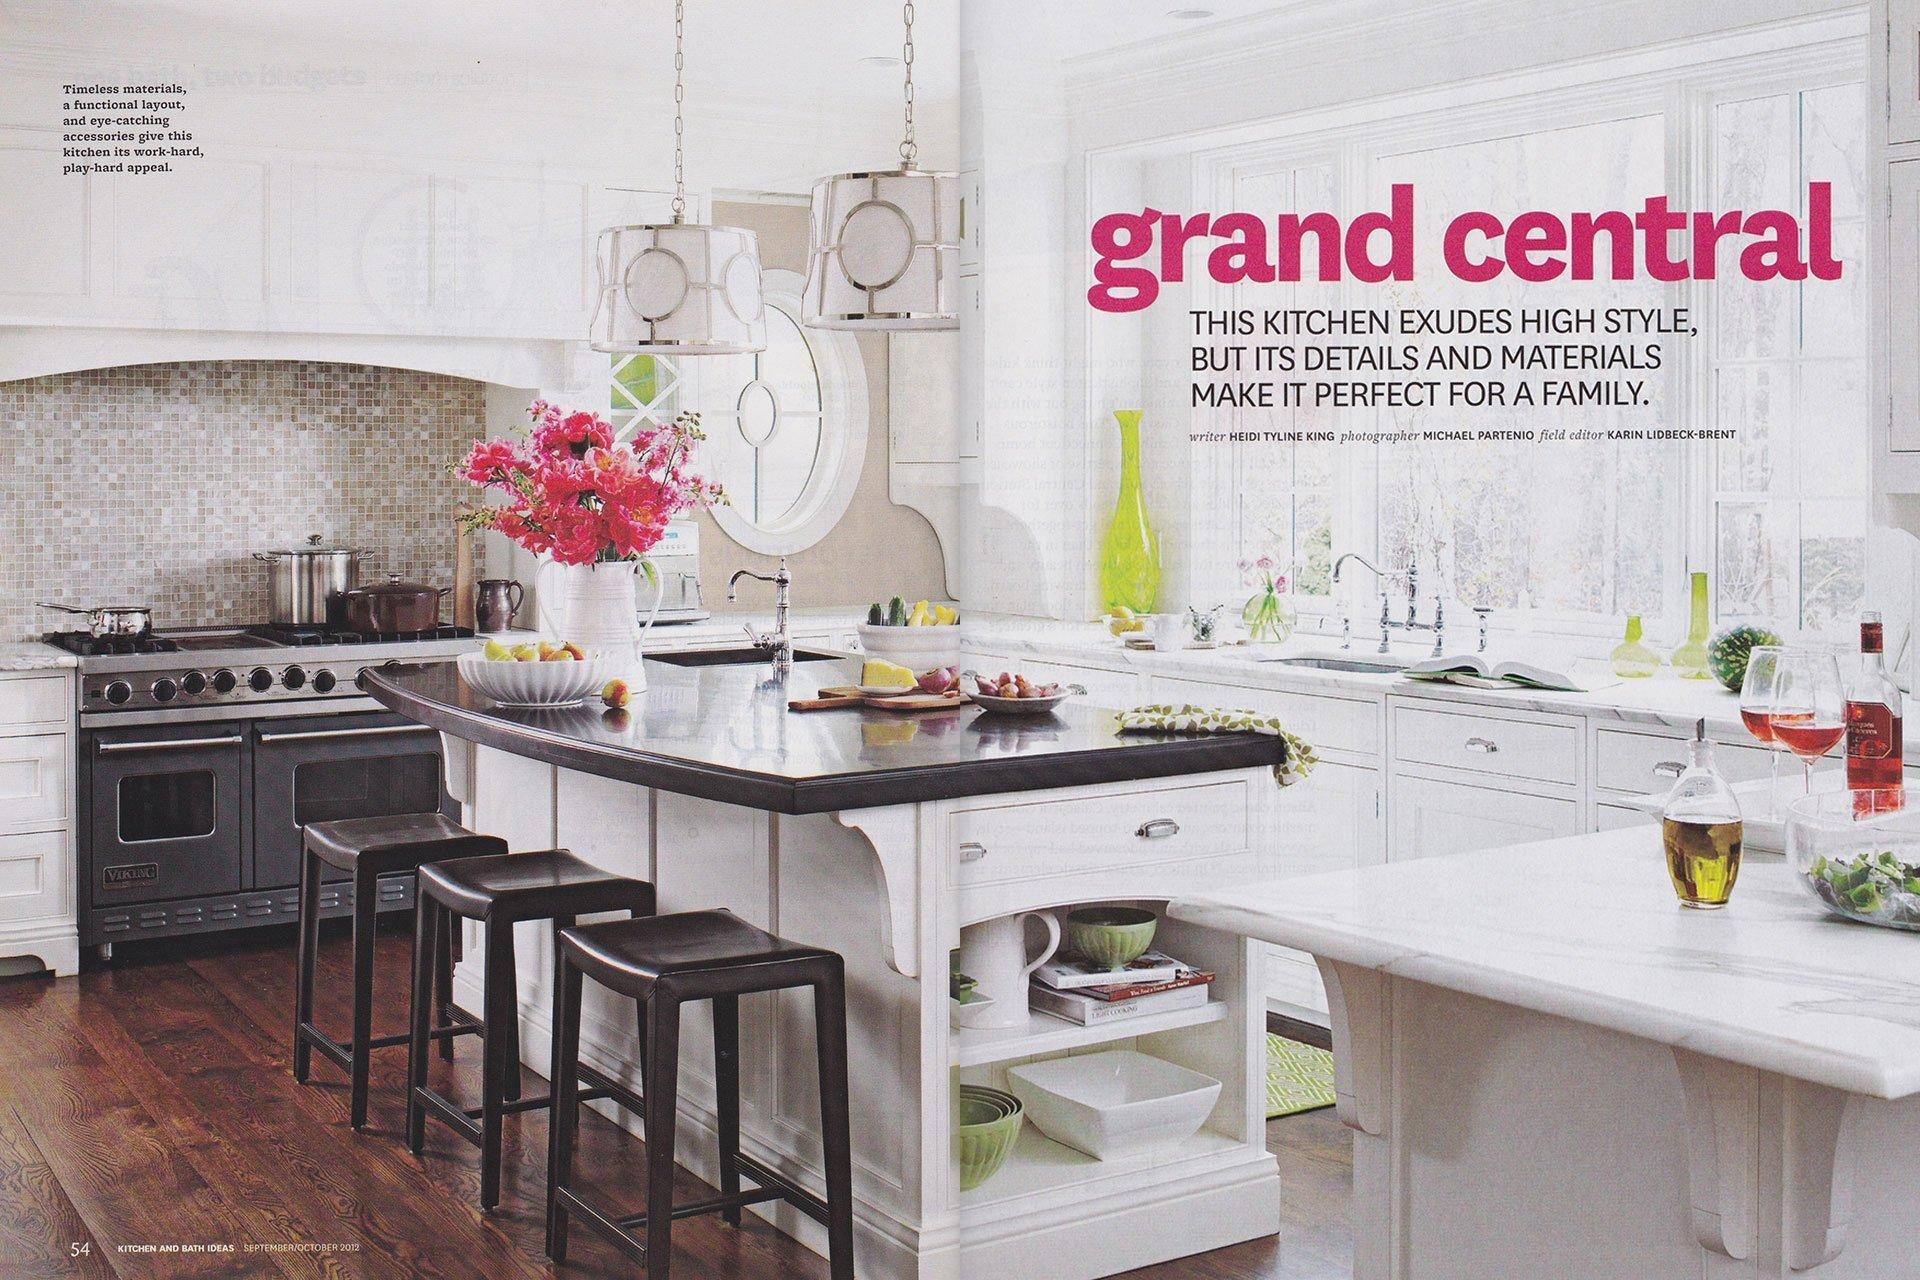 2012 Kitchen & Bath Ideas: Grand Central – Rebecca Reynolds Design